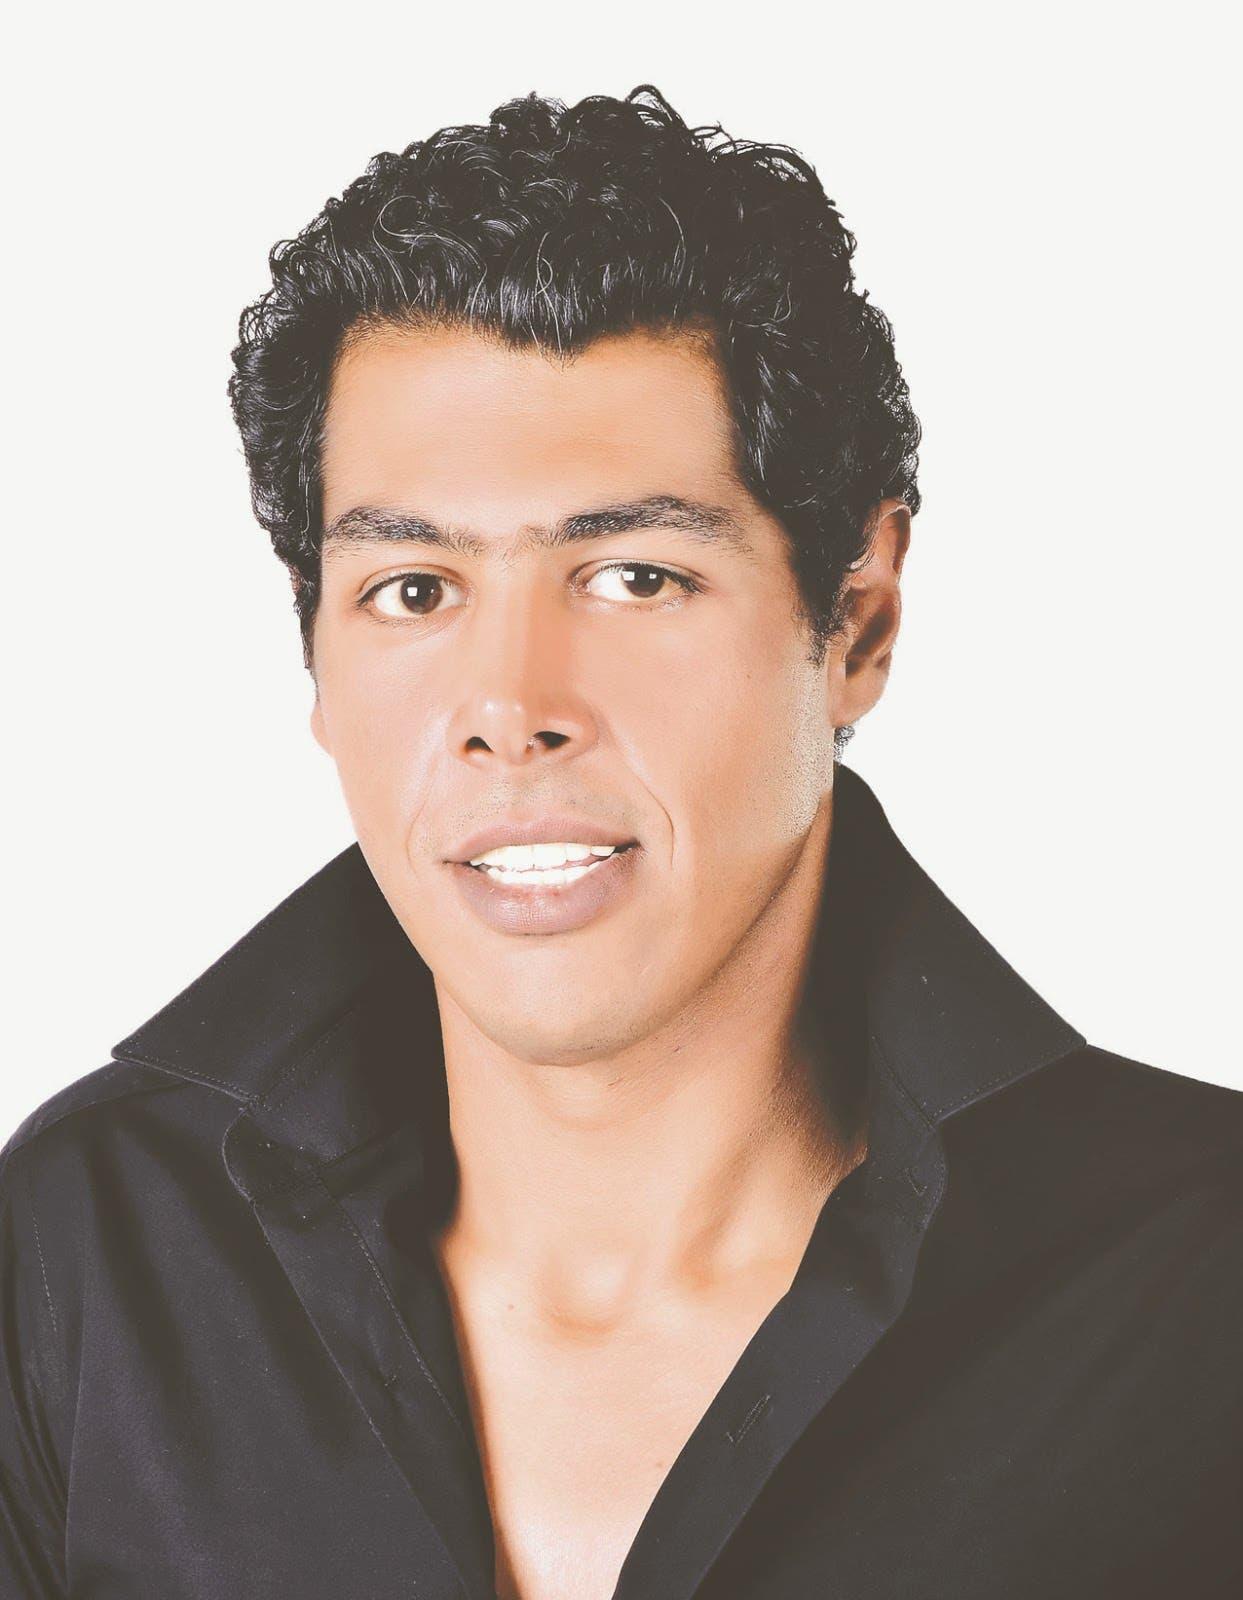 عمر مصطفى متولي